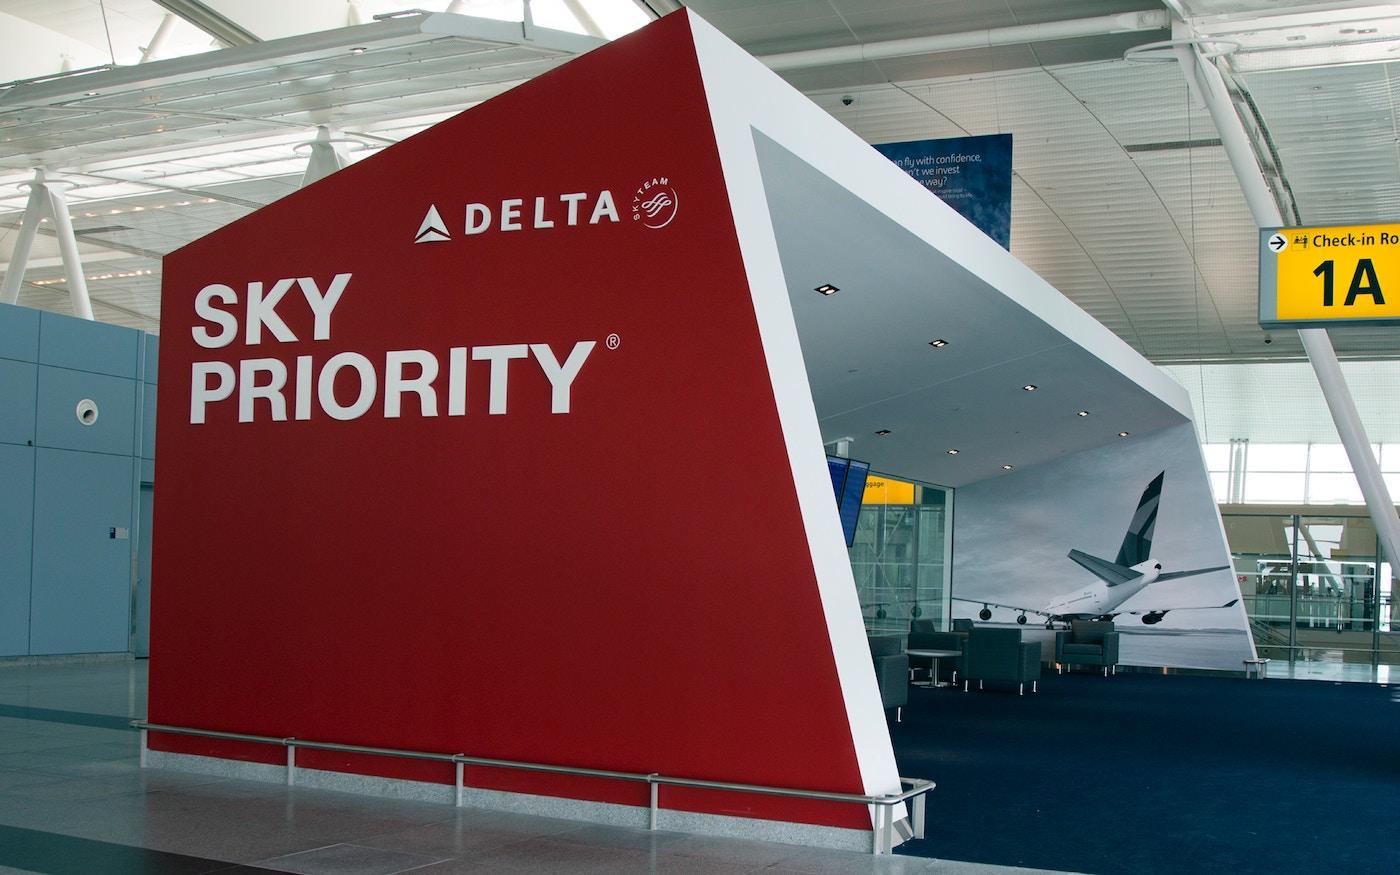 Delta Sky Priority Lounge